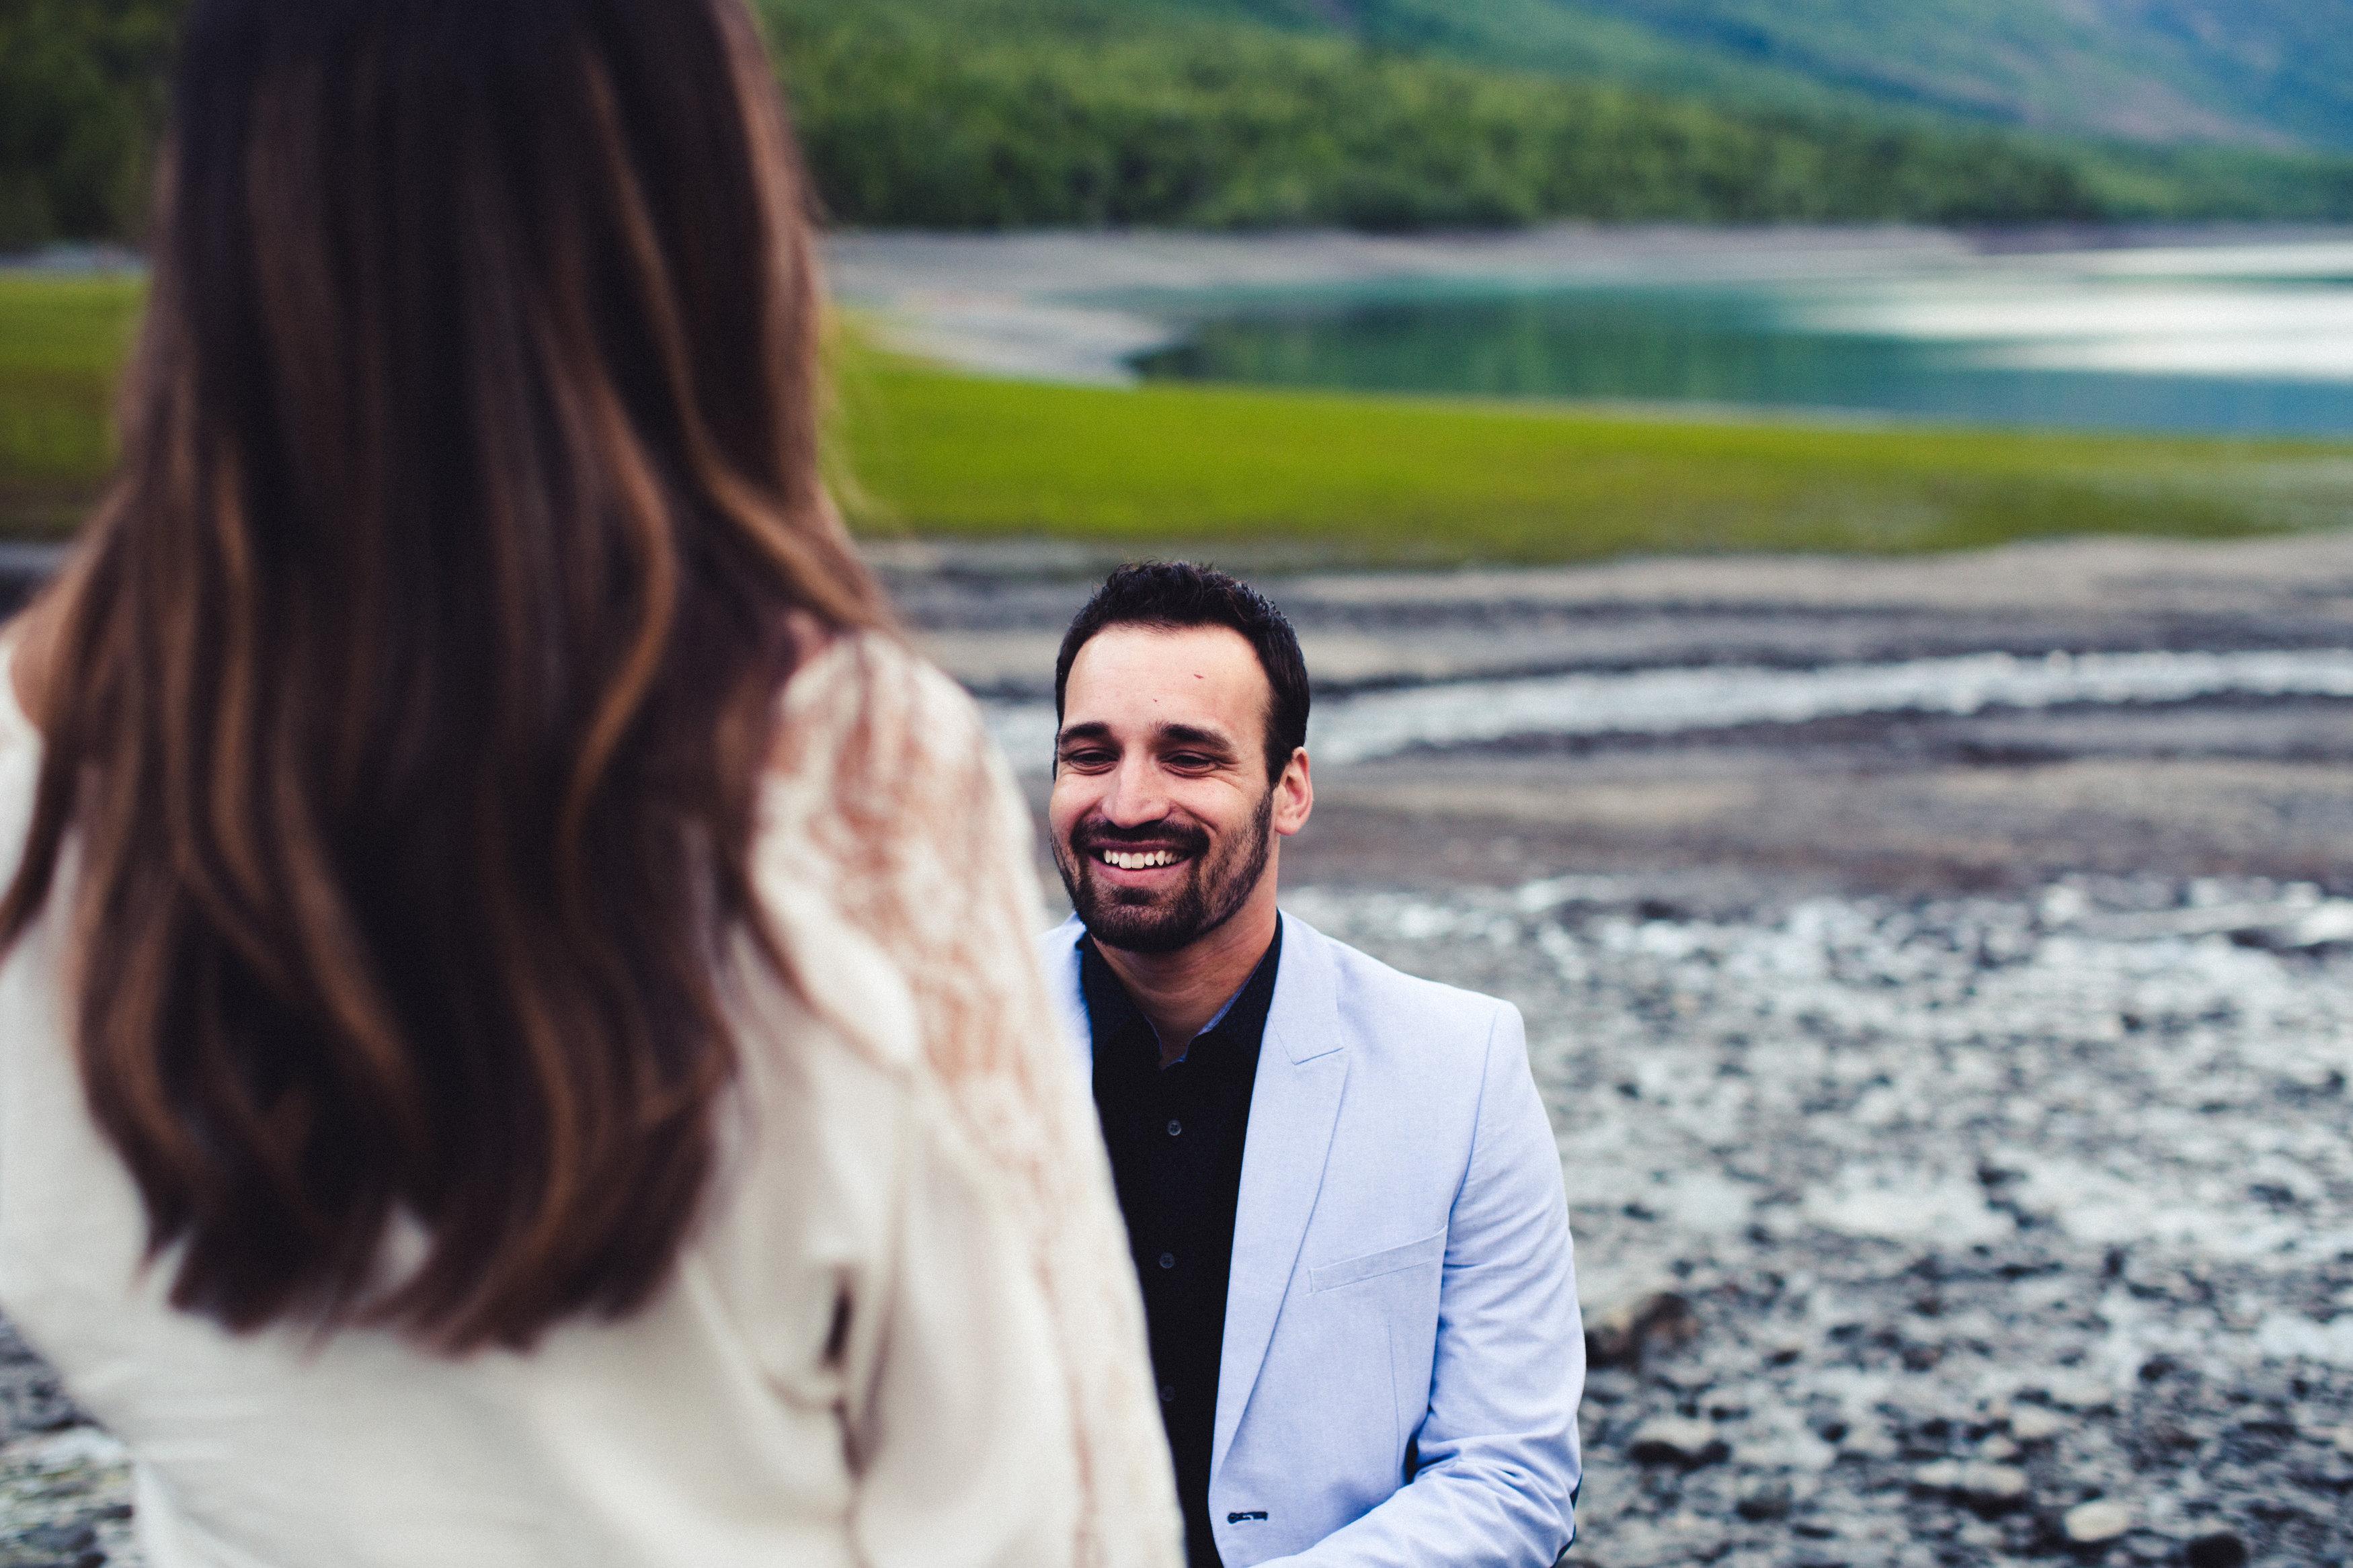 Image 3 of Rebeca and Josh's Beautiful Proposal in Alaska